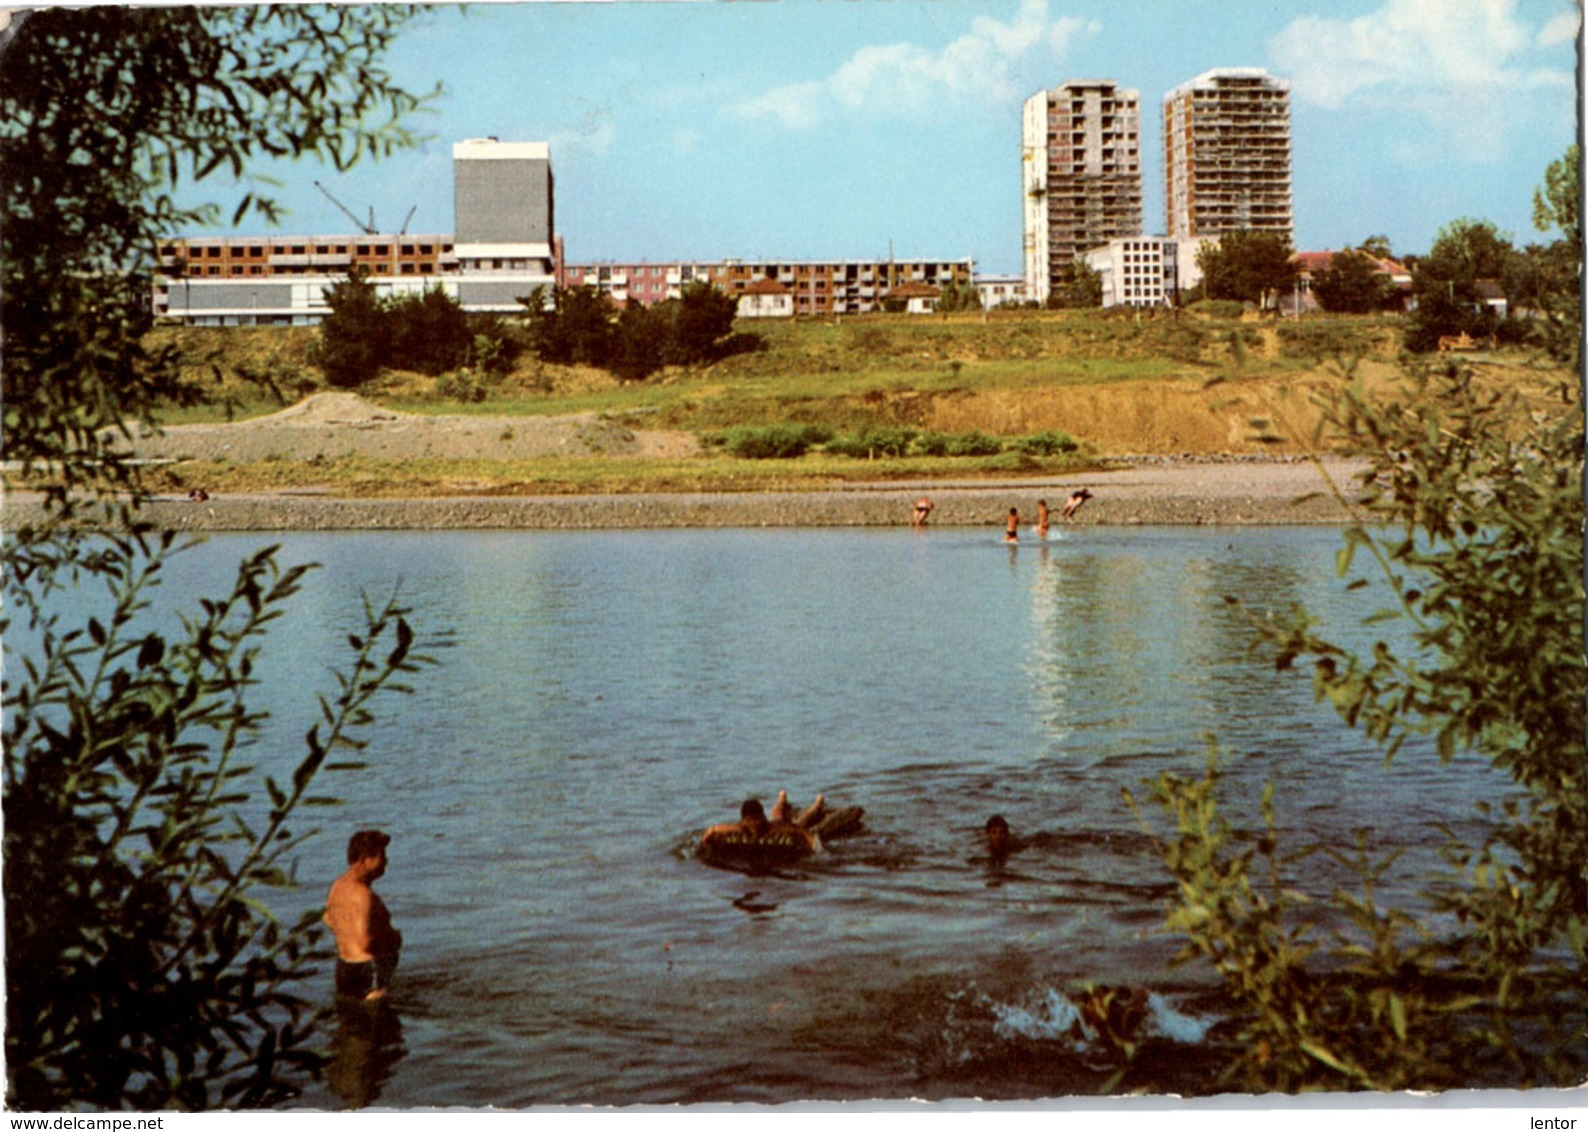 Kt 052 / Kraljevo, Ibar River - Serbia